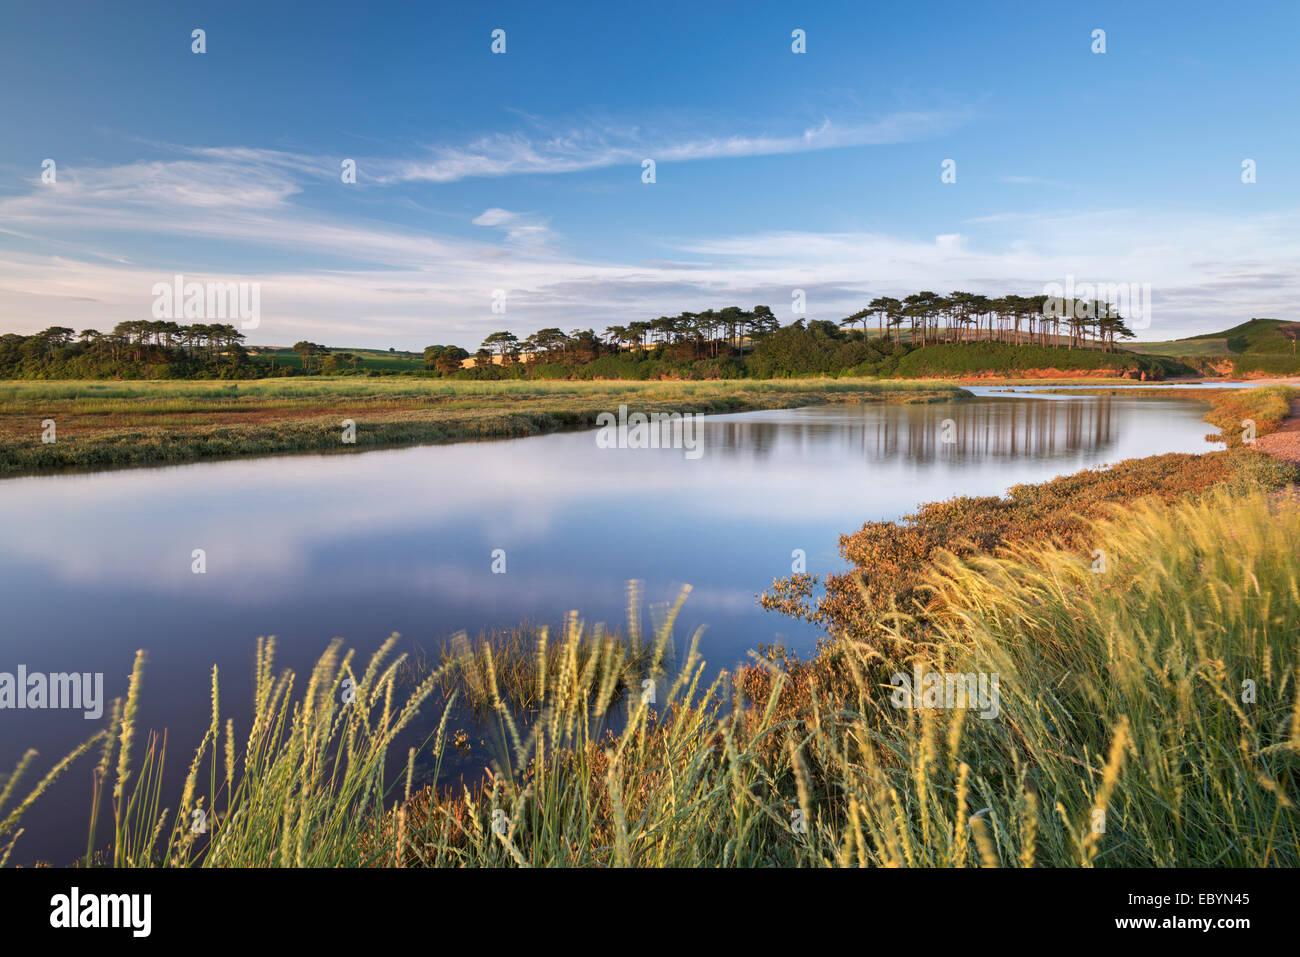 Otter Estuary at Budleigh Salterton, Devon, England. Summer (July) 2014. - Stock Image